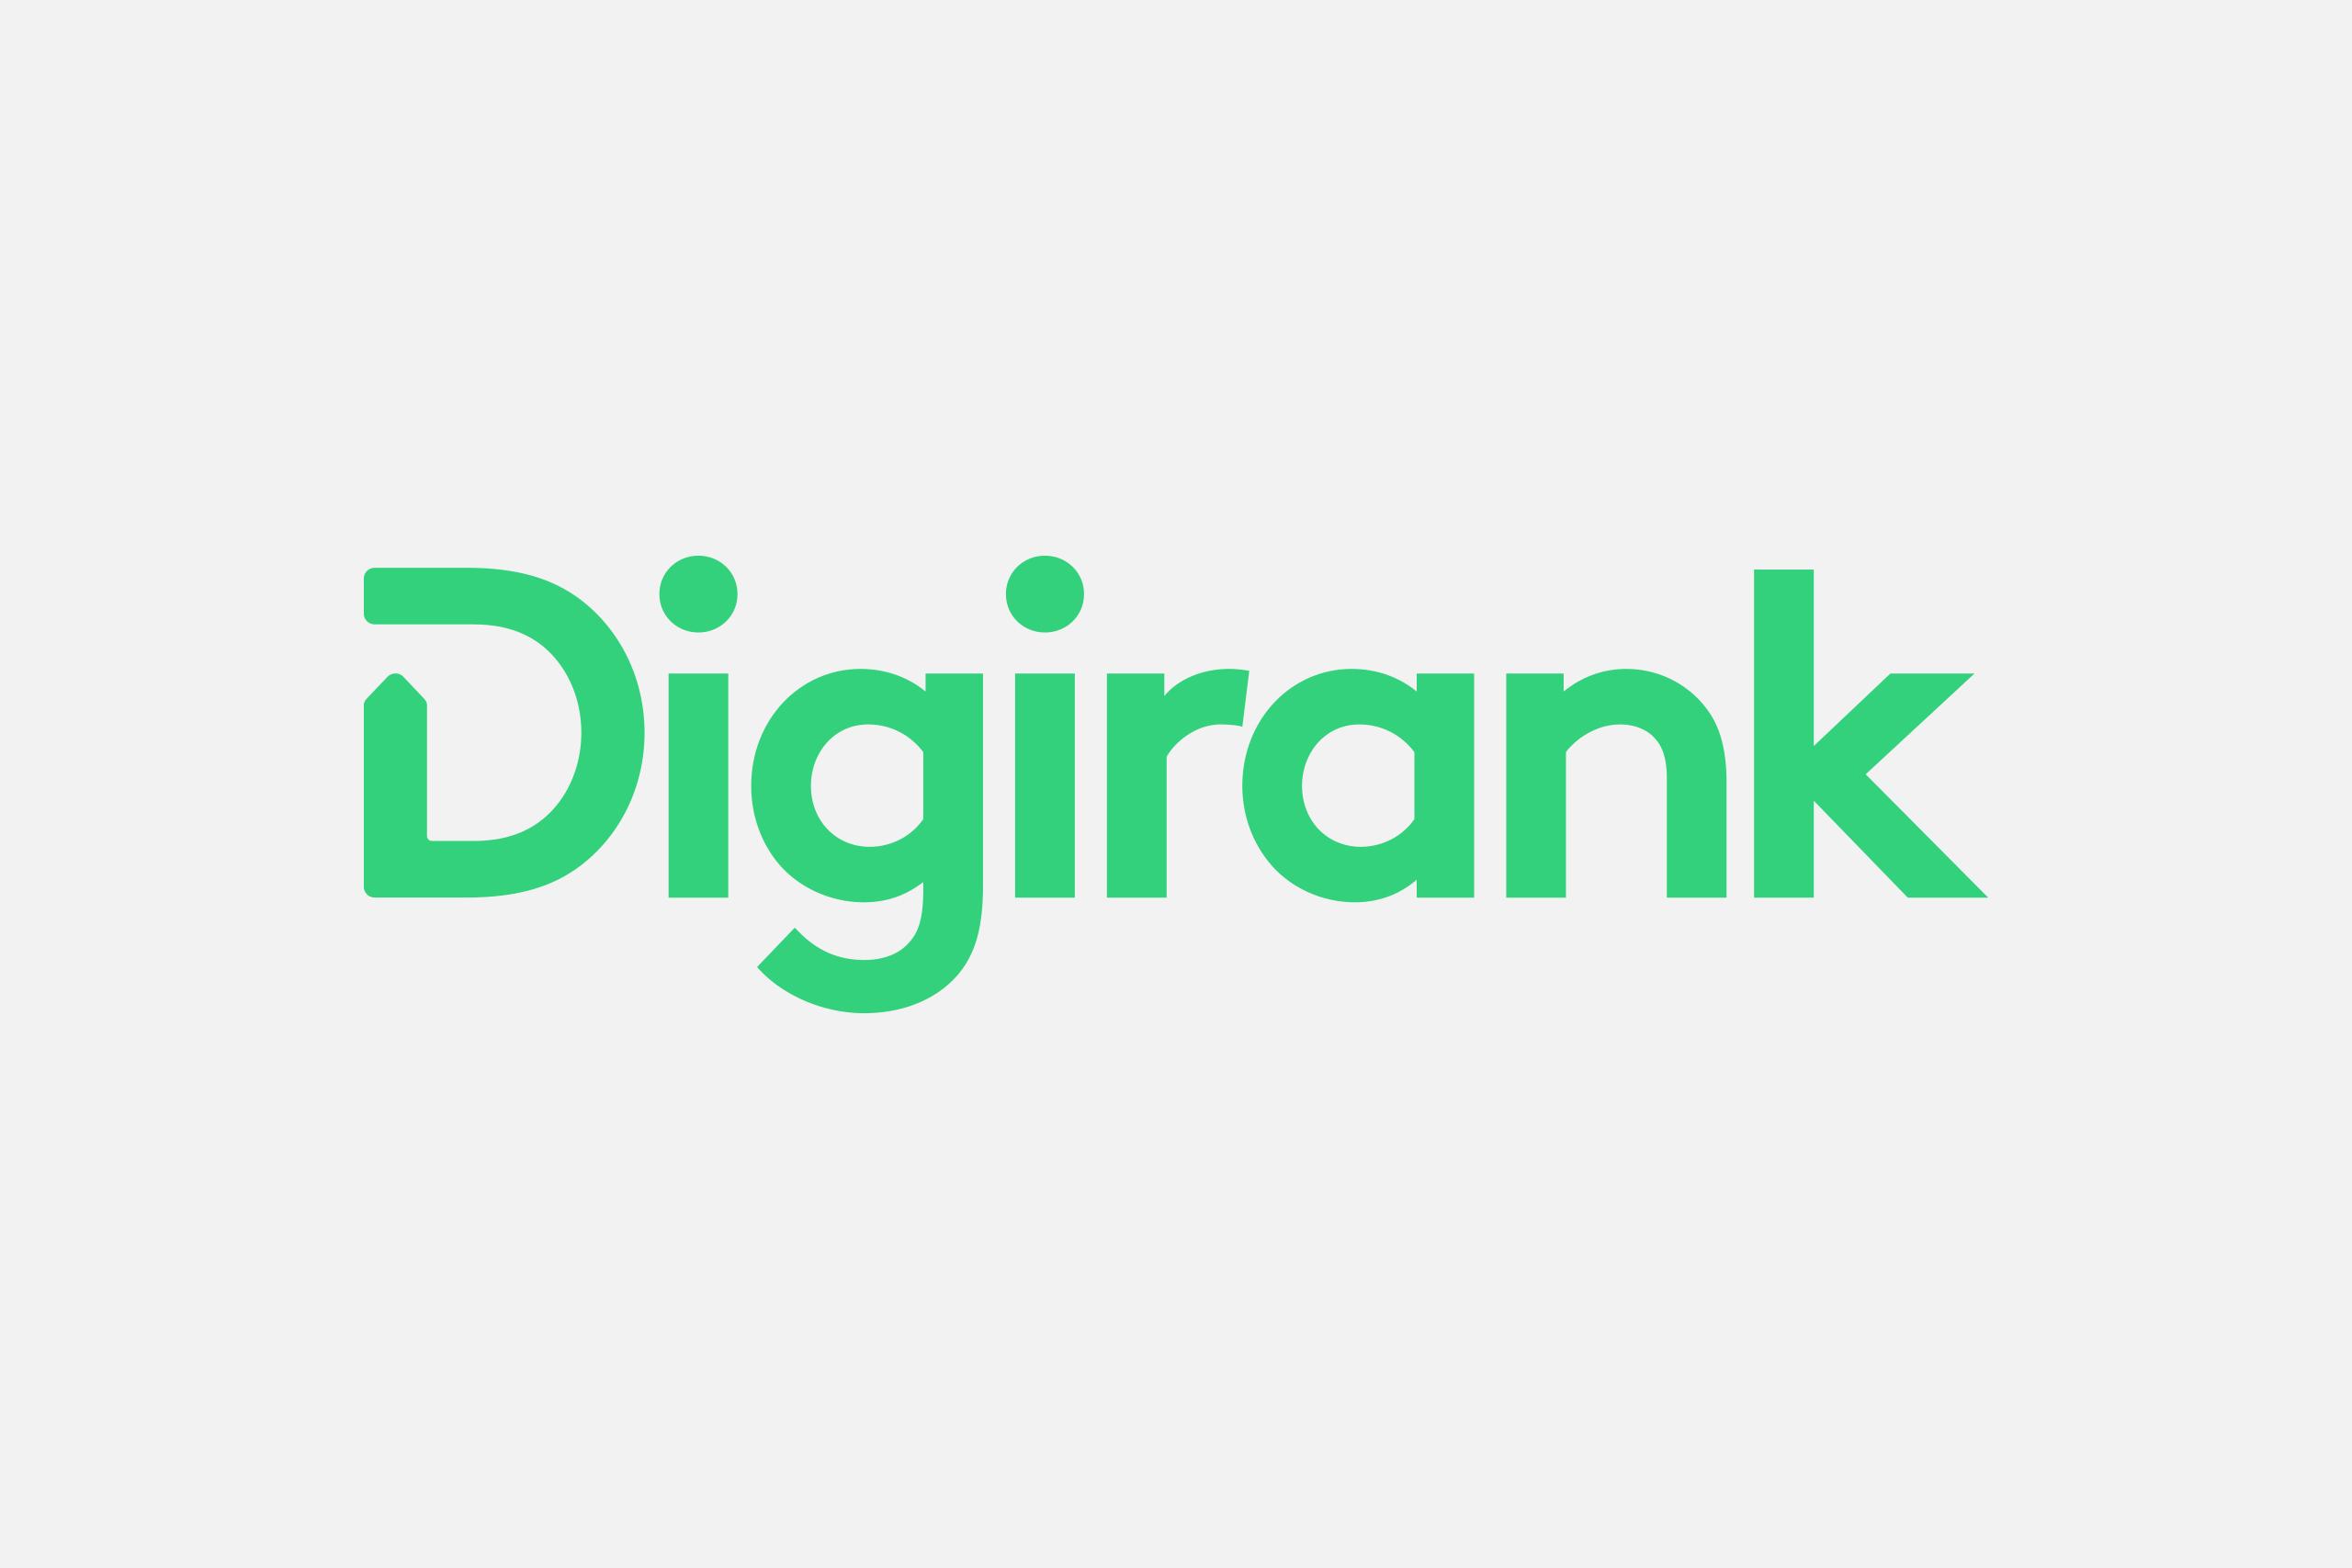 digirank logo on light grey background